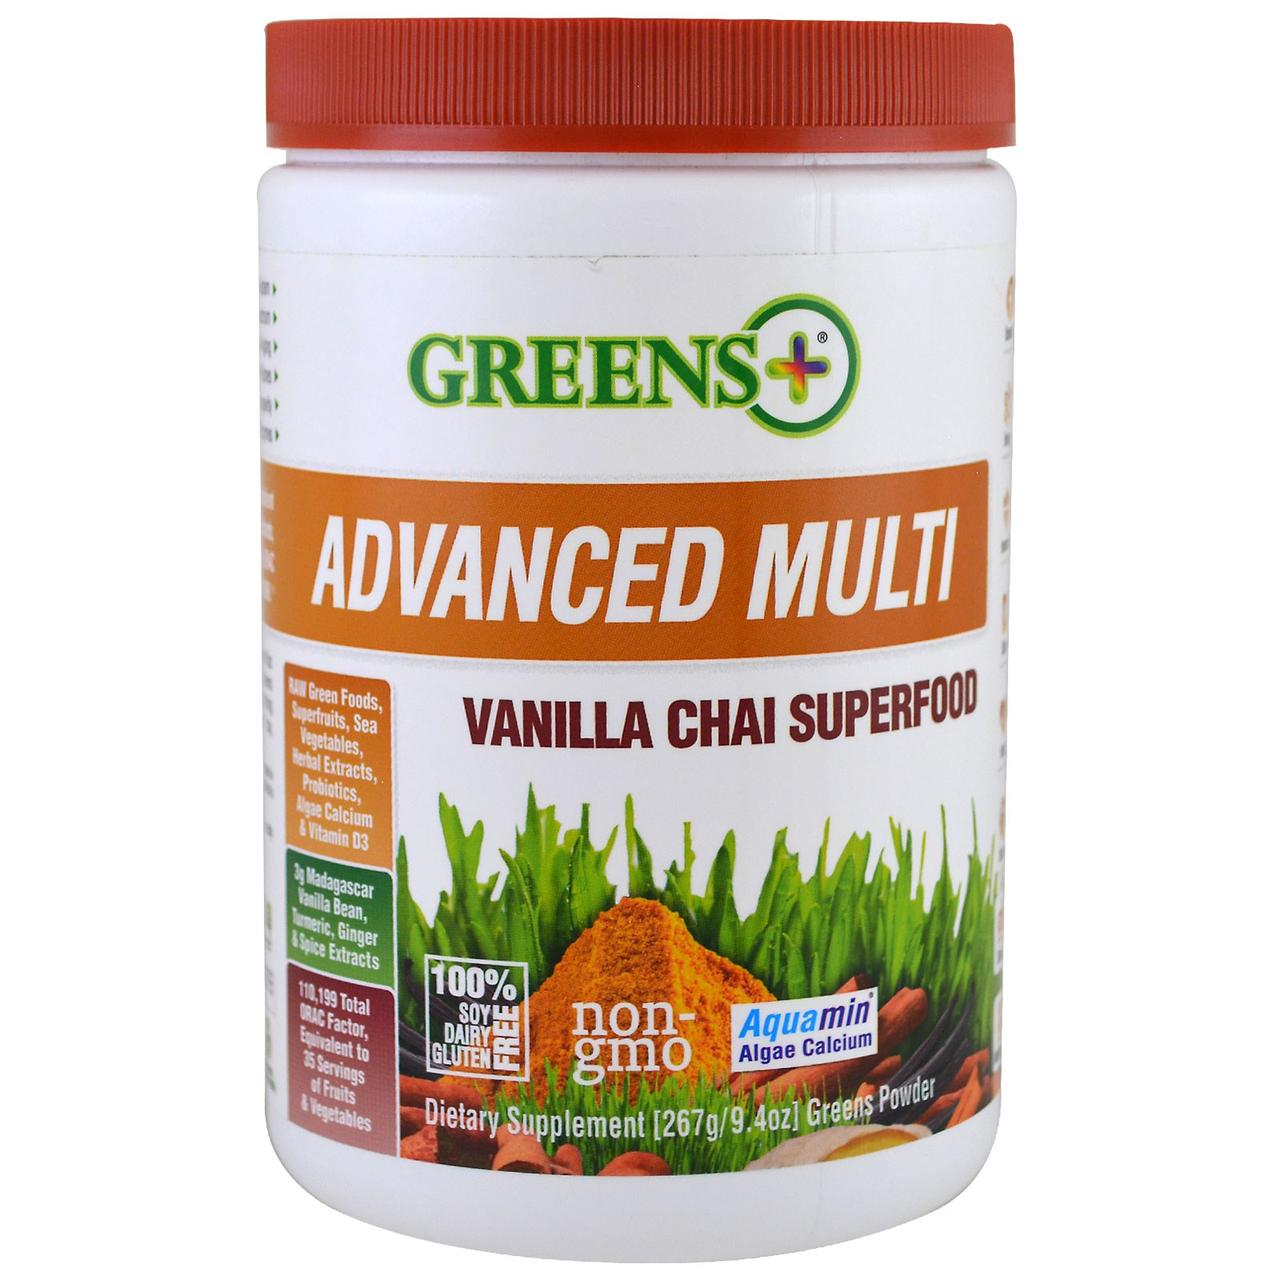 Greens Plus, Advanced Multi Vanilla Chai Superfood, 9.4oz